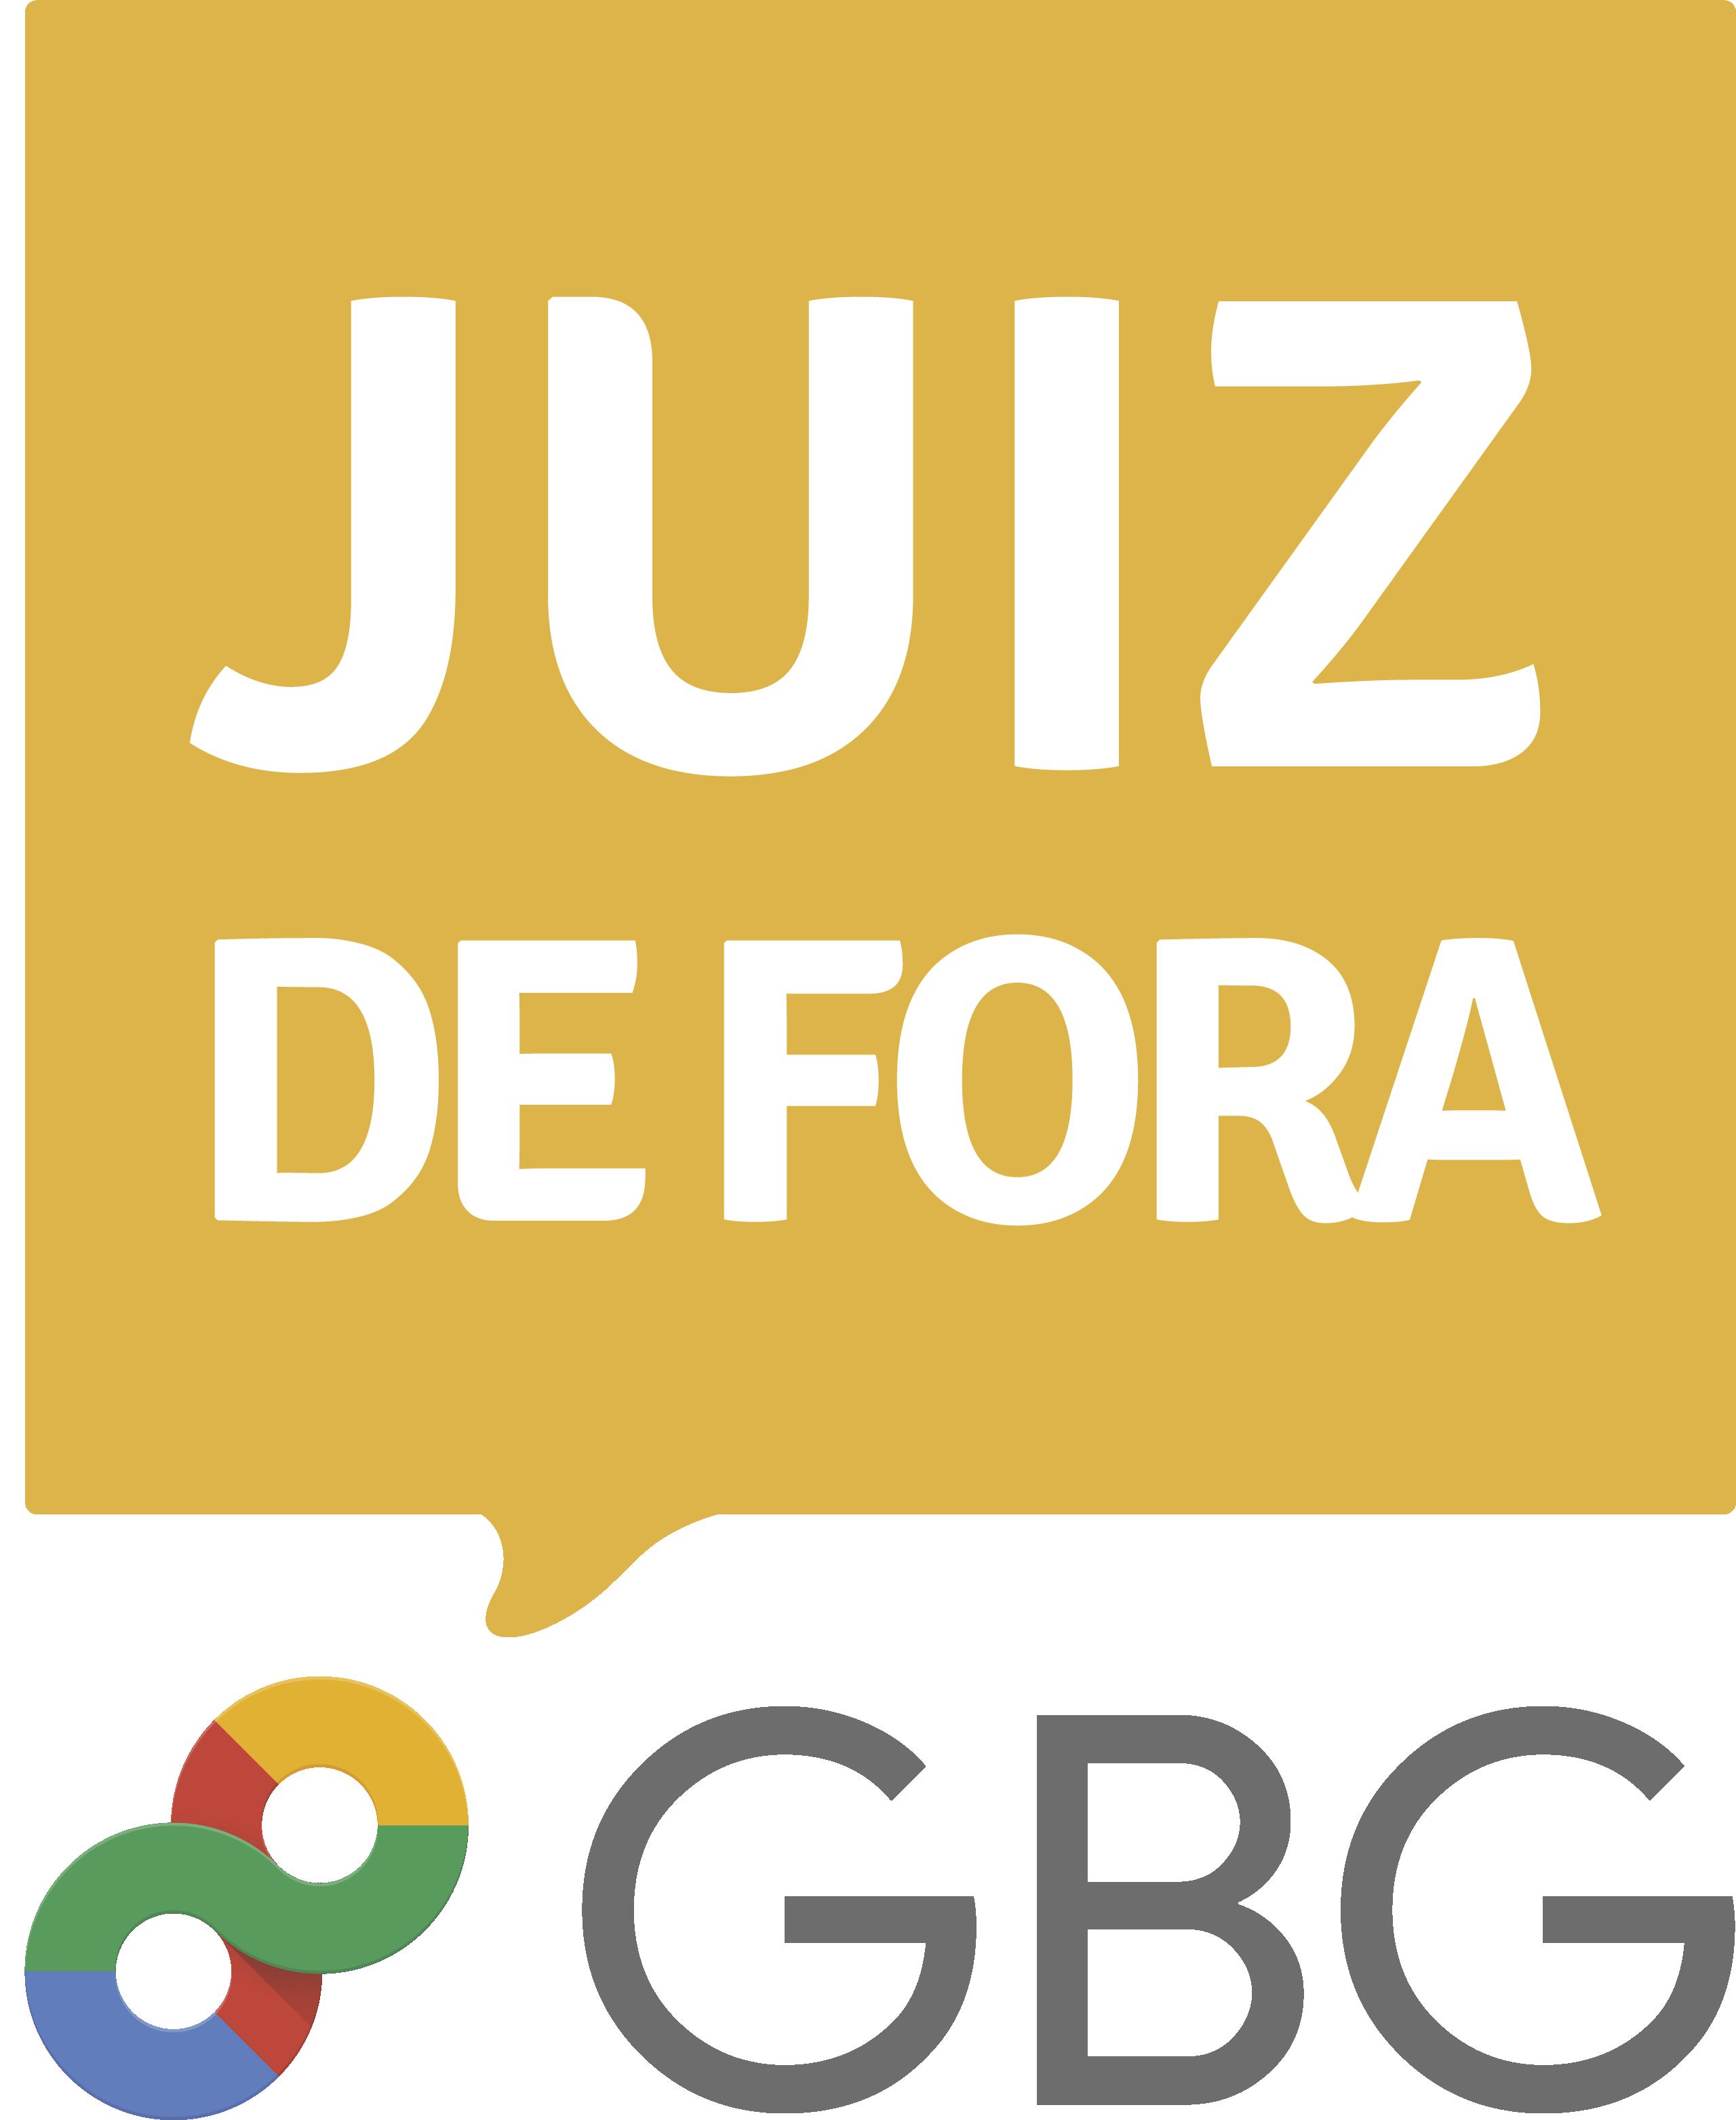 GBGJF – Google Business Group Juiz de Fora